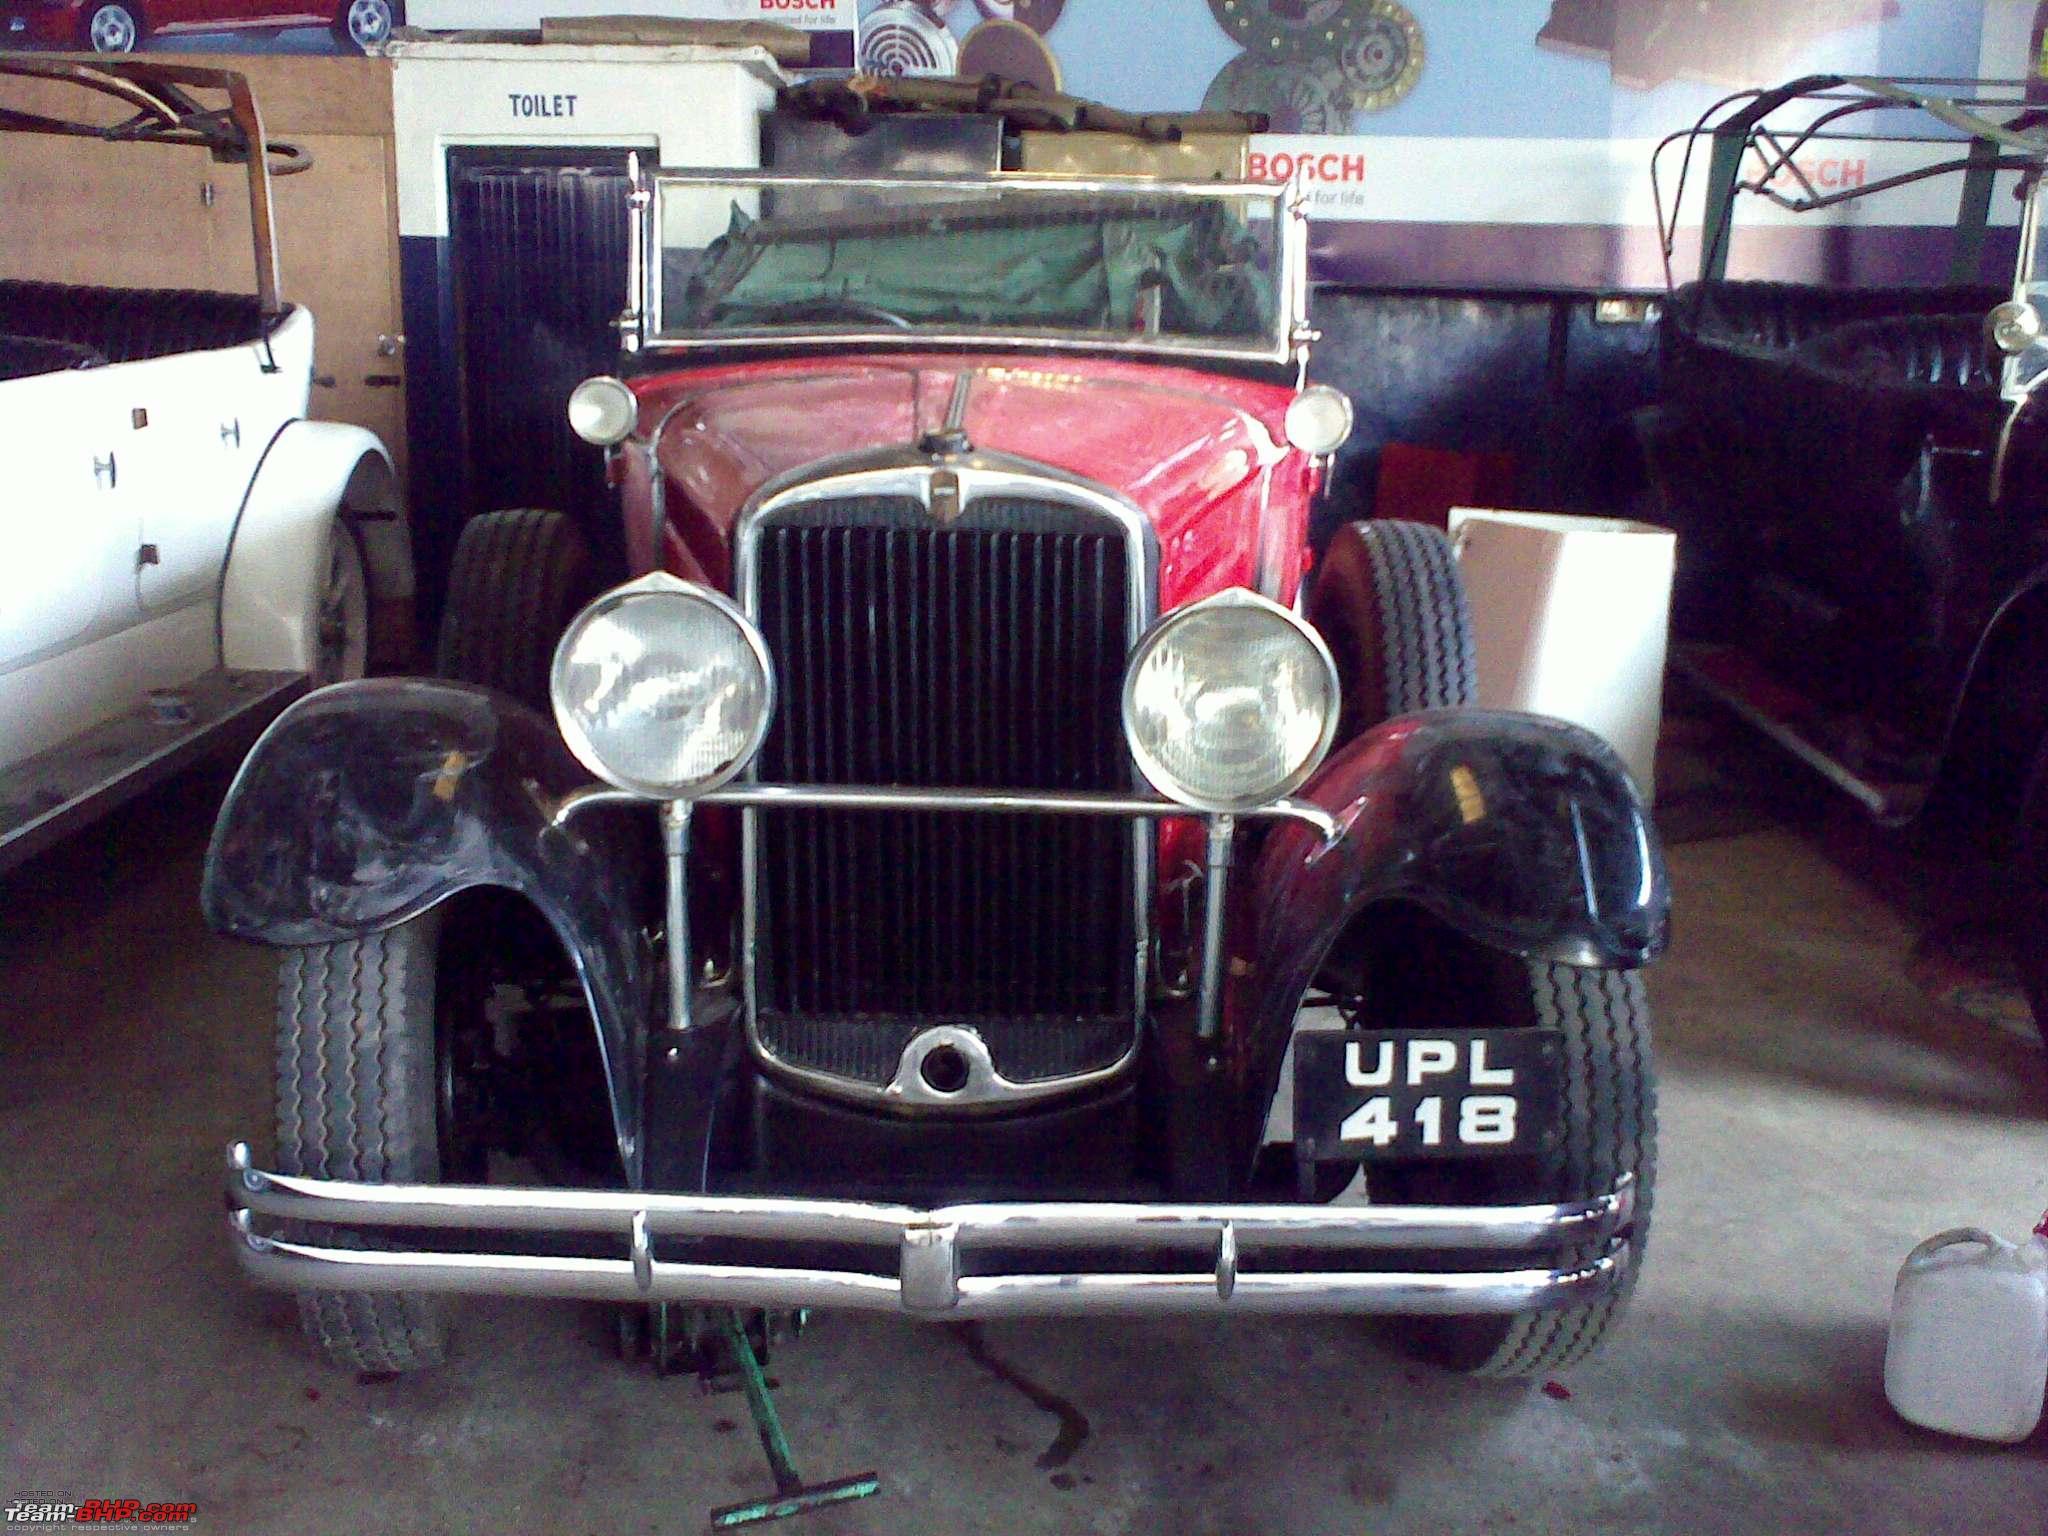 Pics: Vintage & Classic cars